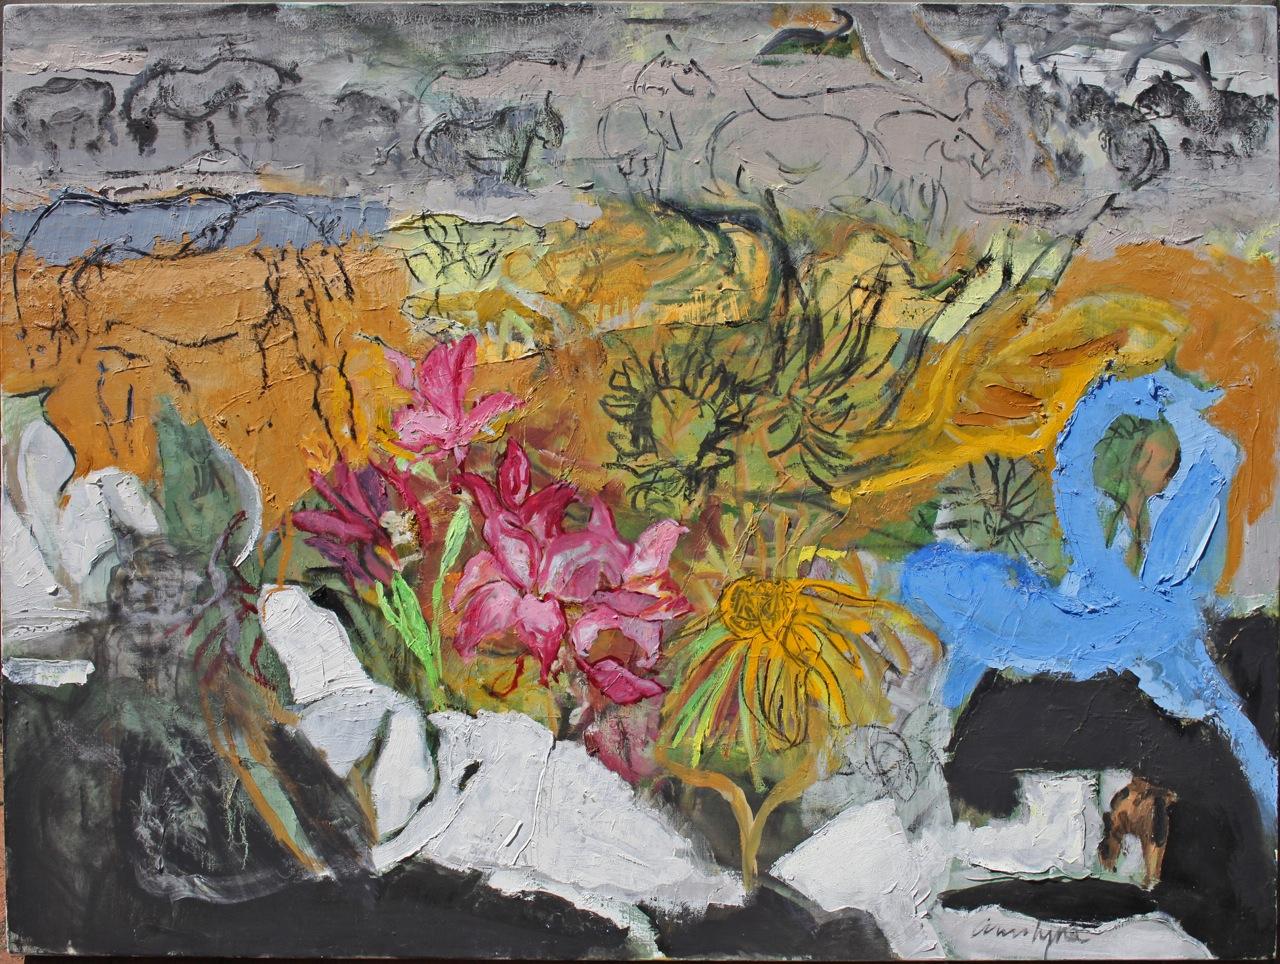 Summer Pastures by Ann Lyne